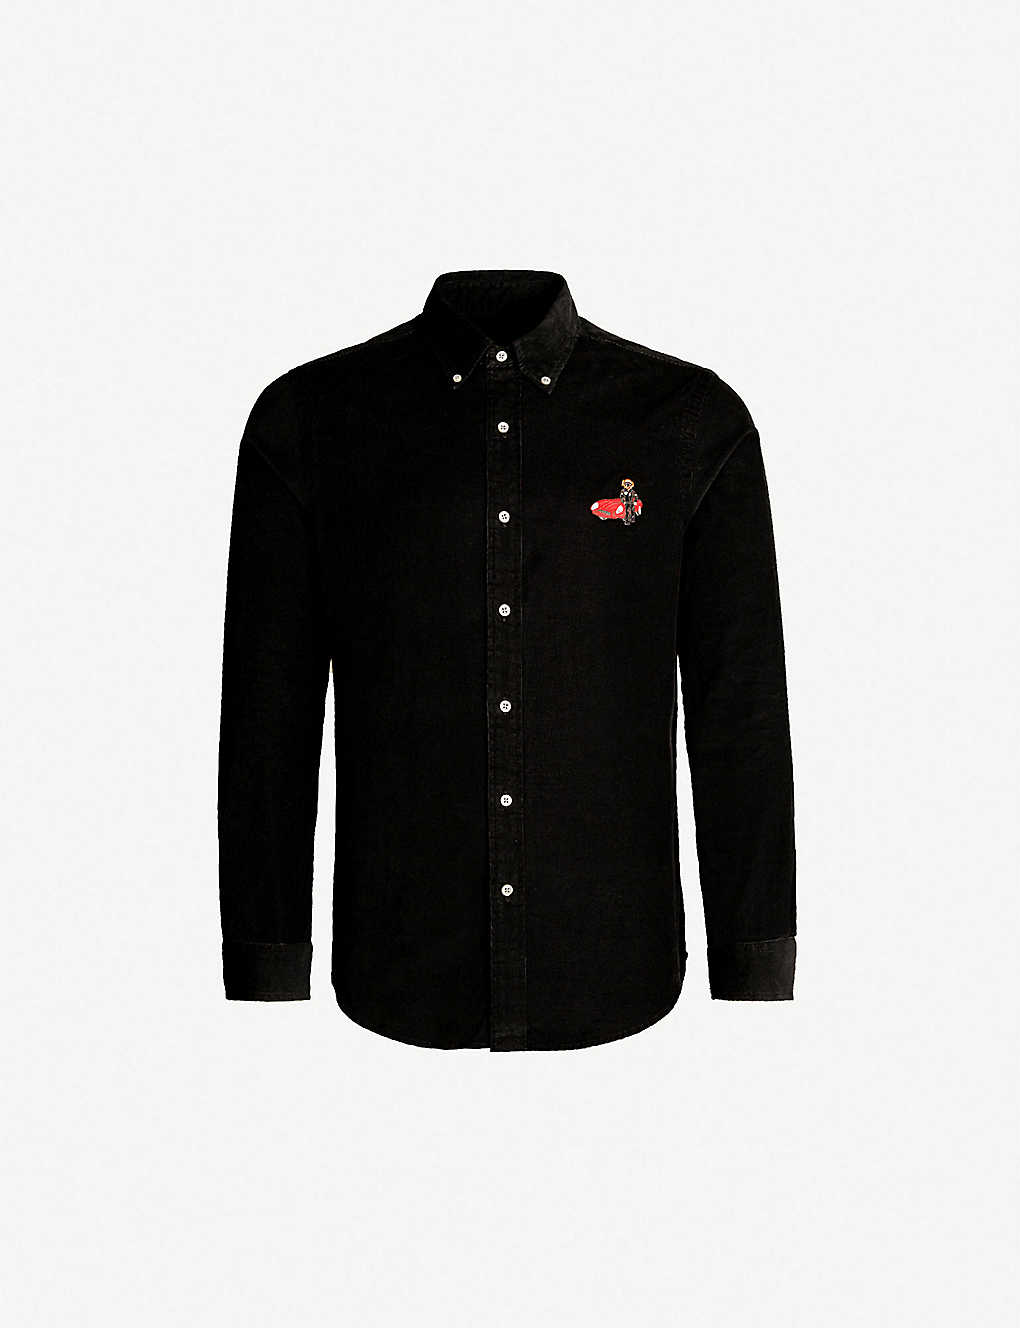 fc873c659 POLO RALPH LAUREN - Bear-embroidered slim-fit corduroy shirt |  Selfridges.com